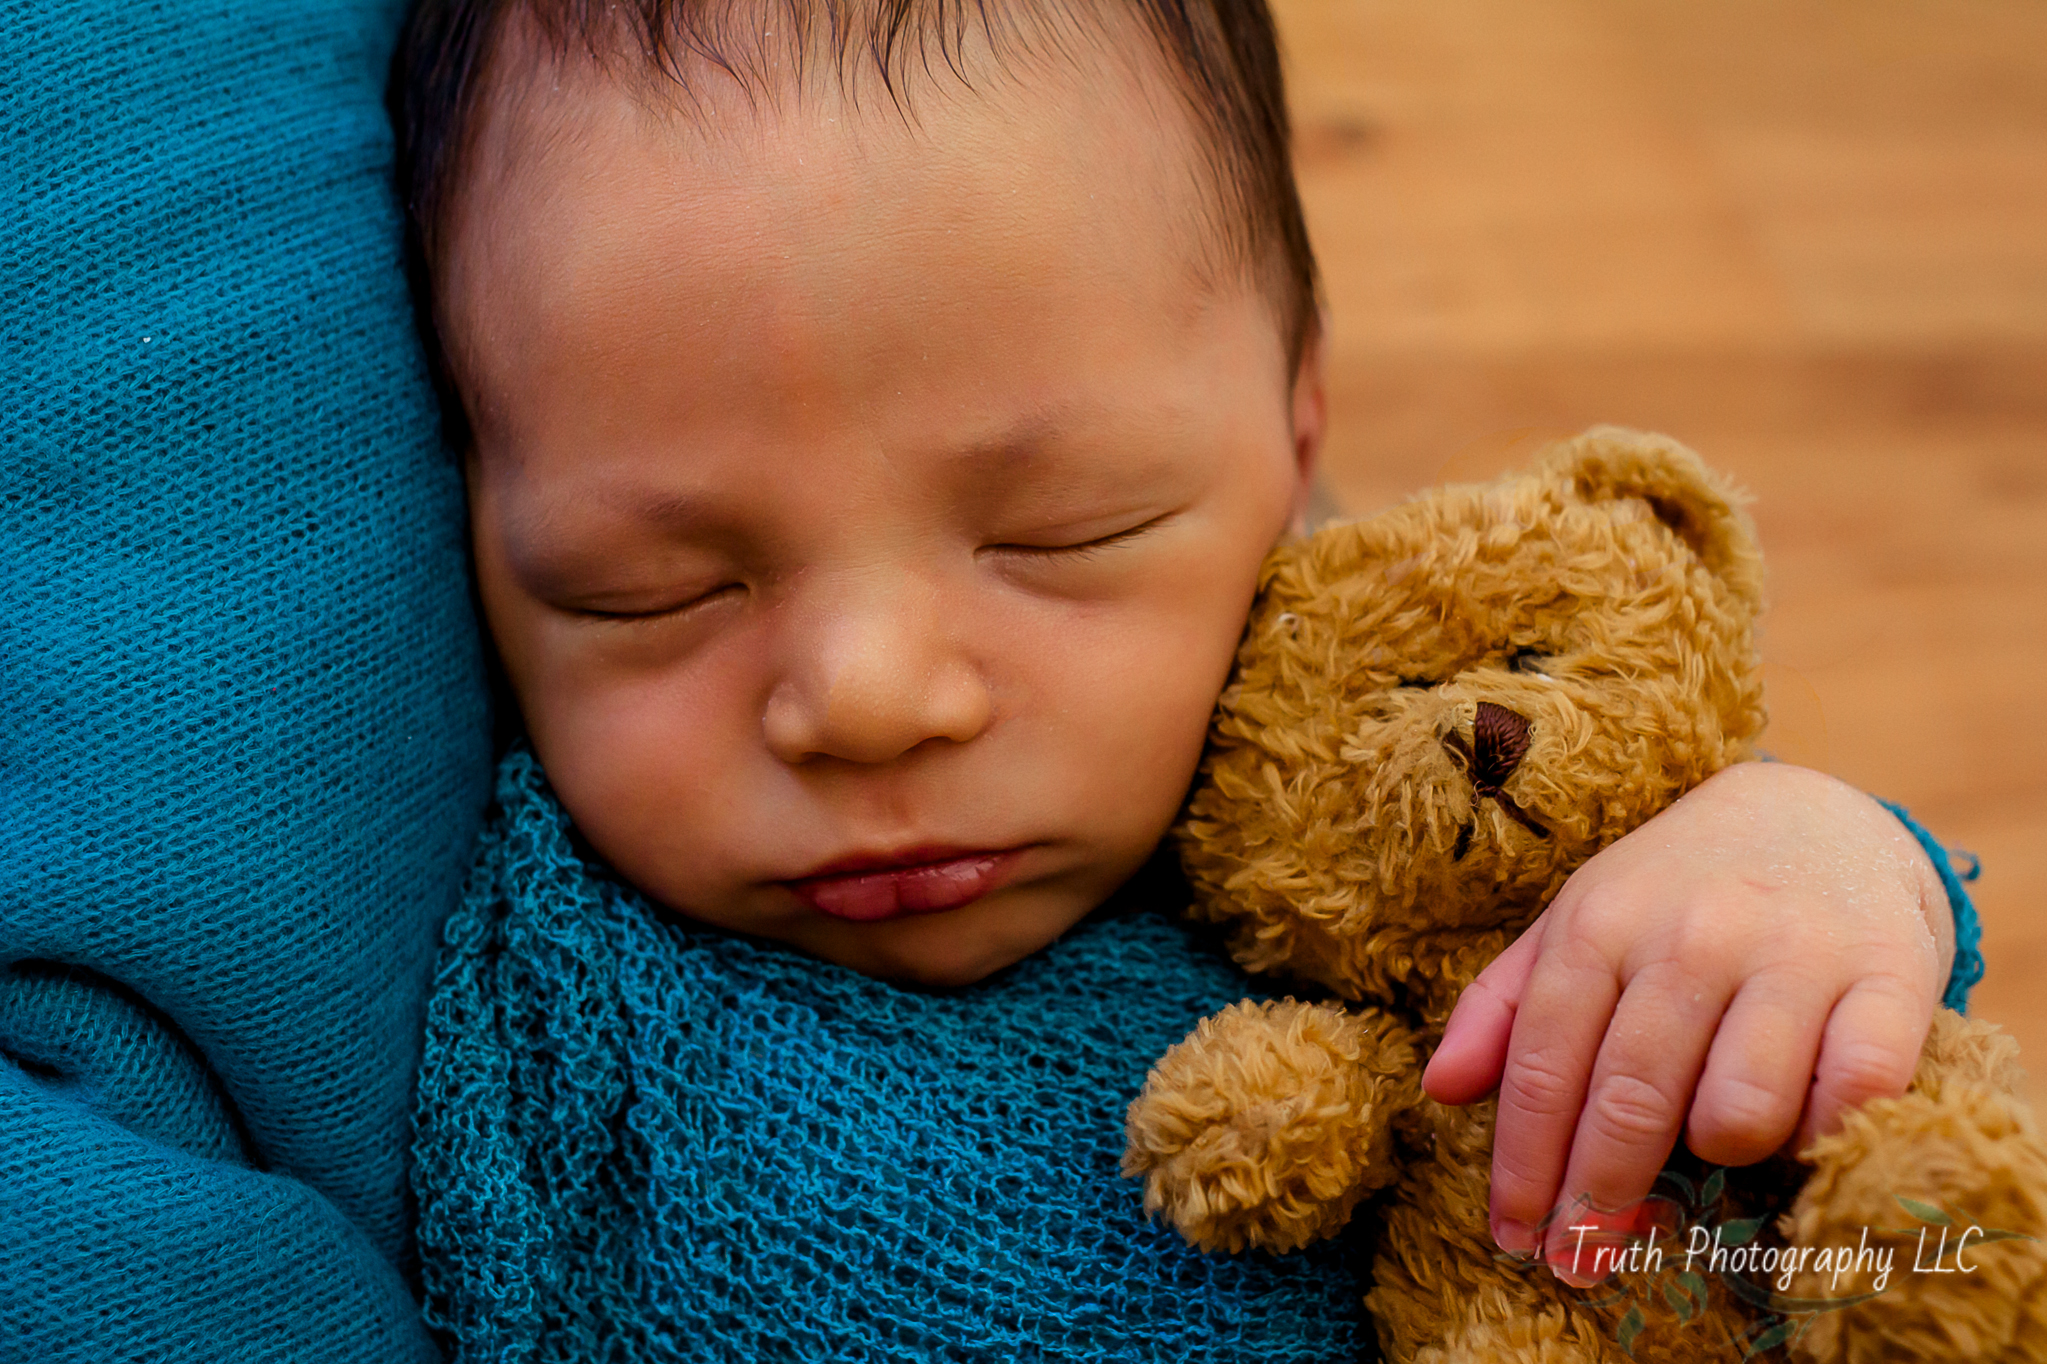 Truth-Photography-Broomfield-newborn-photographer.jpg